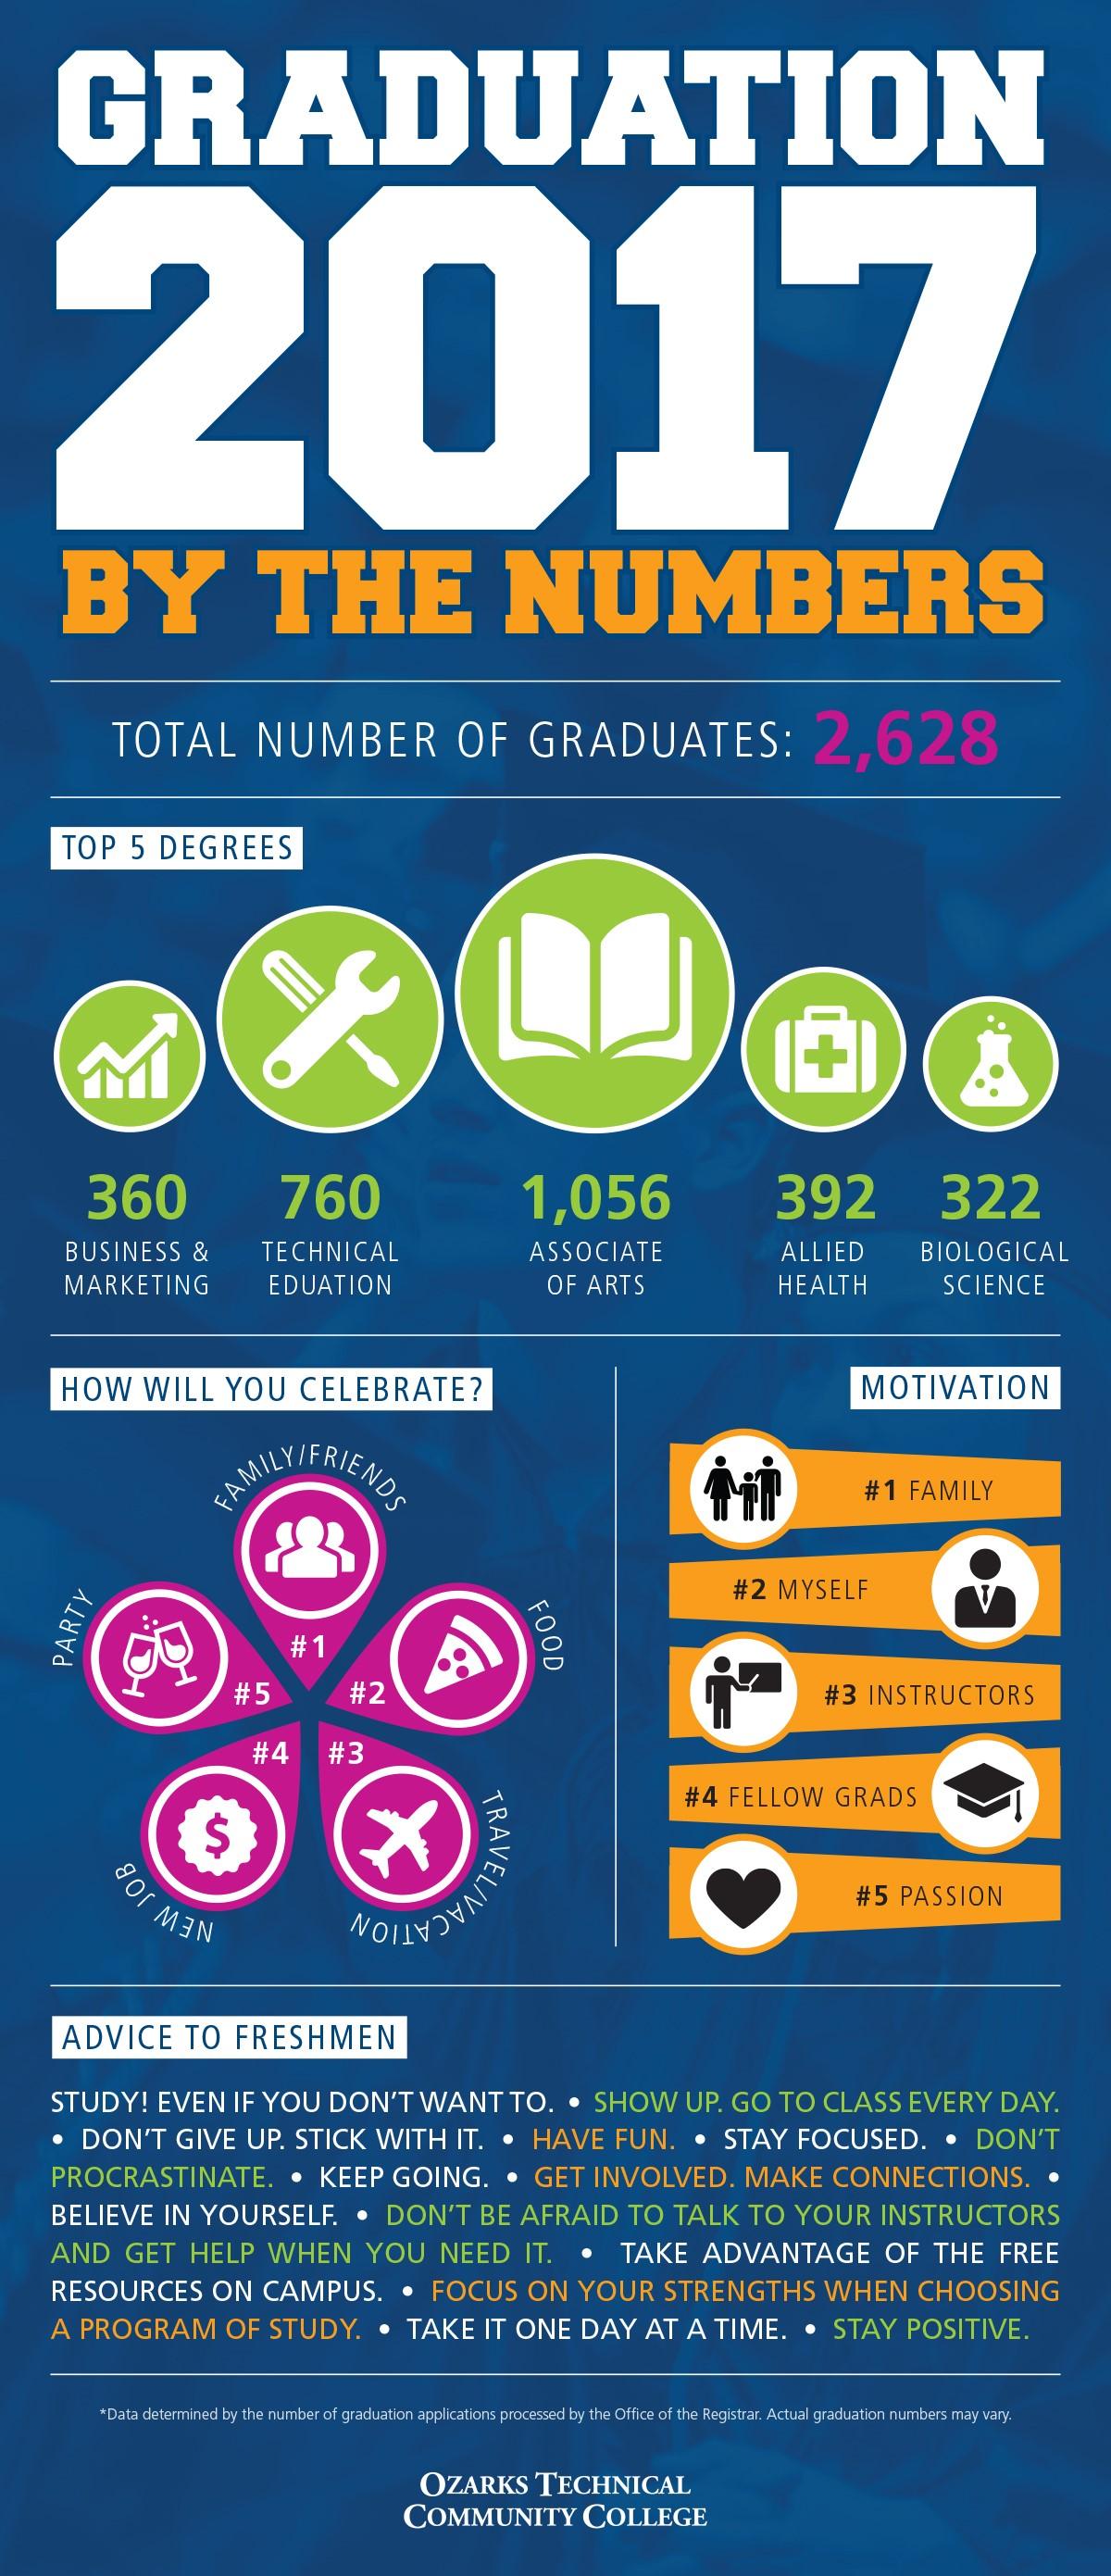 graduation 2017 infographic